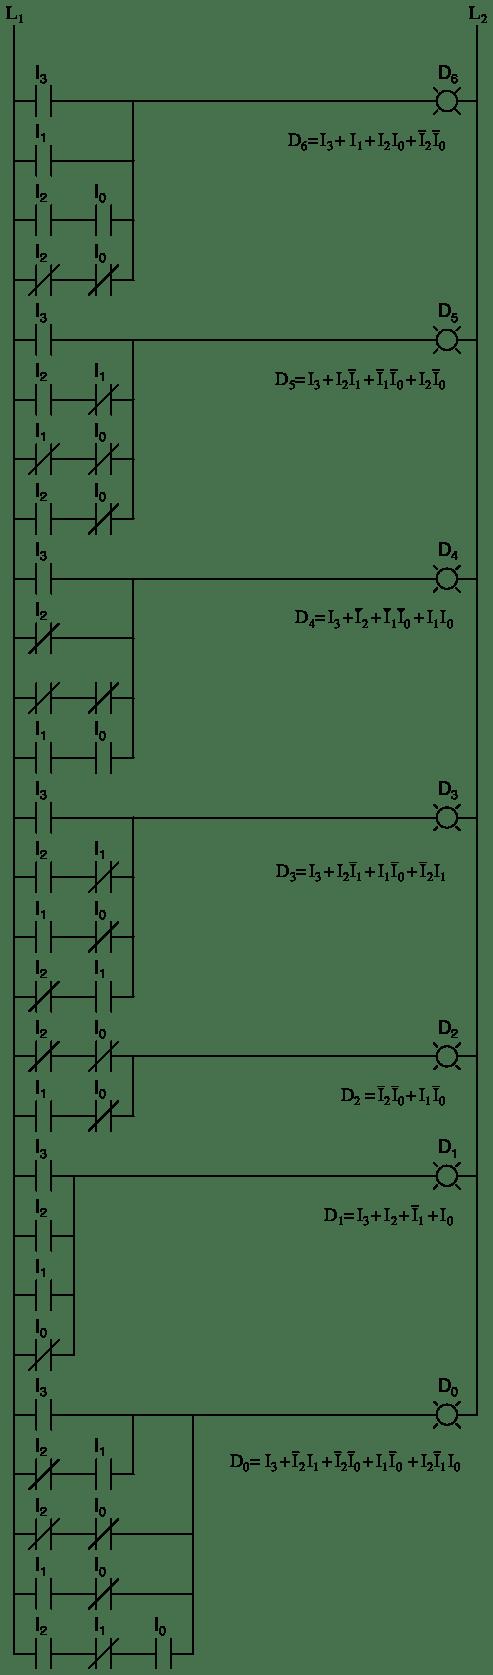 hight resolution of 4 to 16 decoder logic diagram